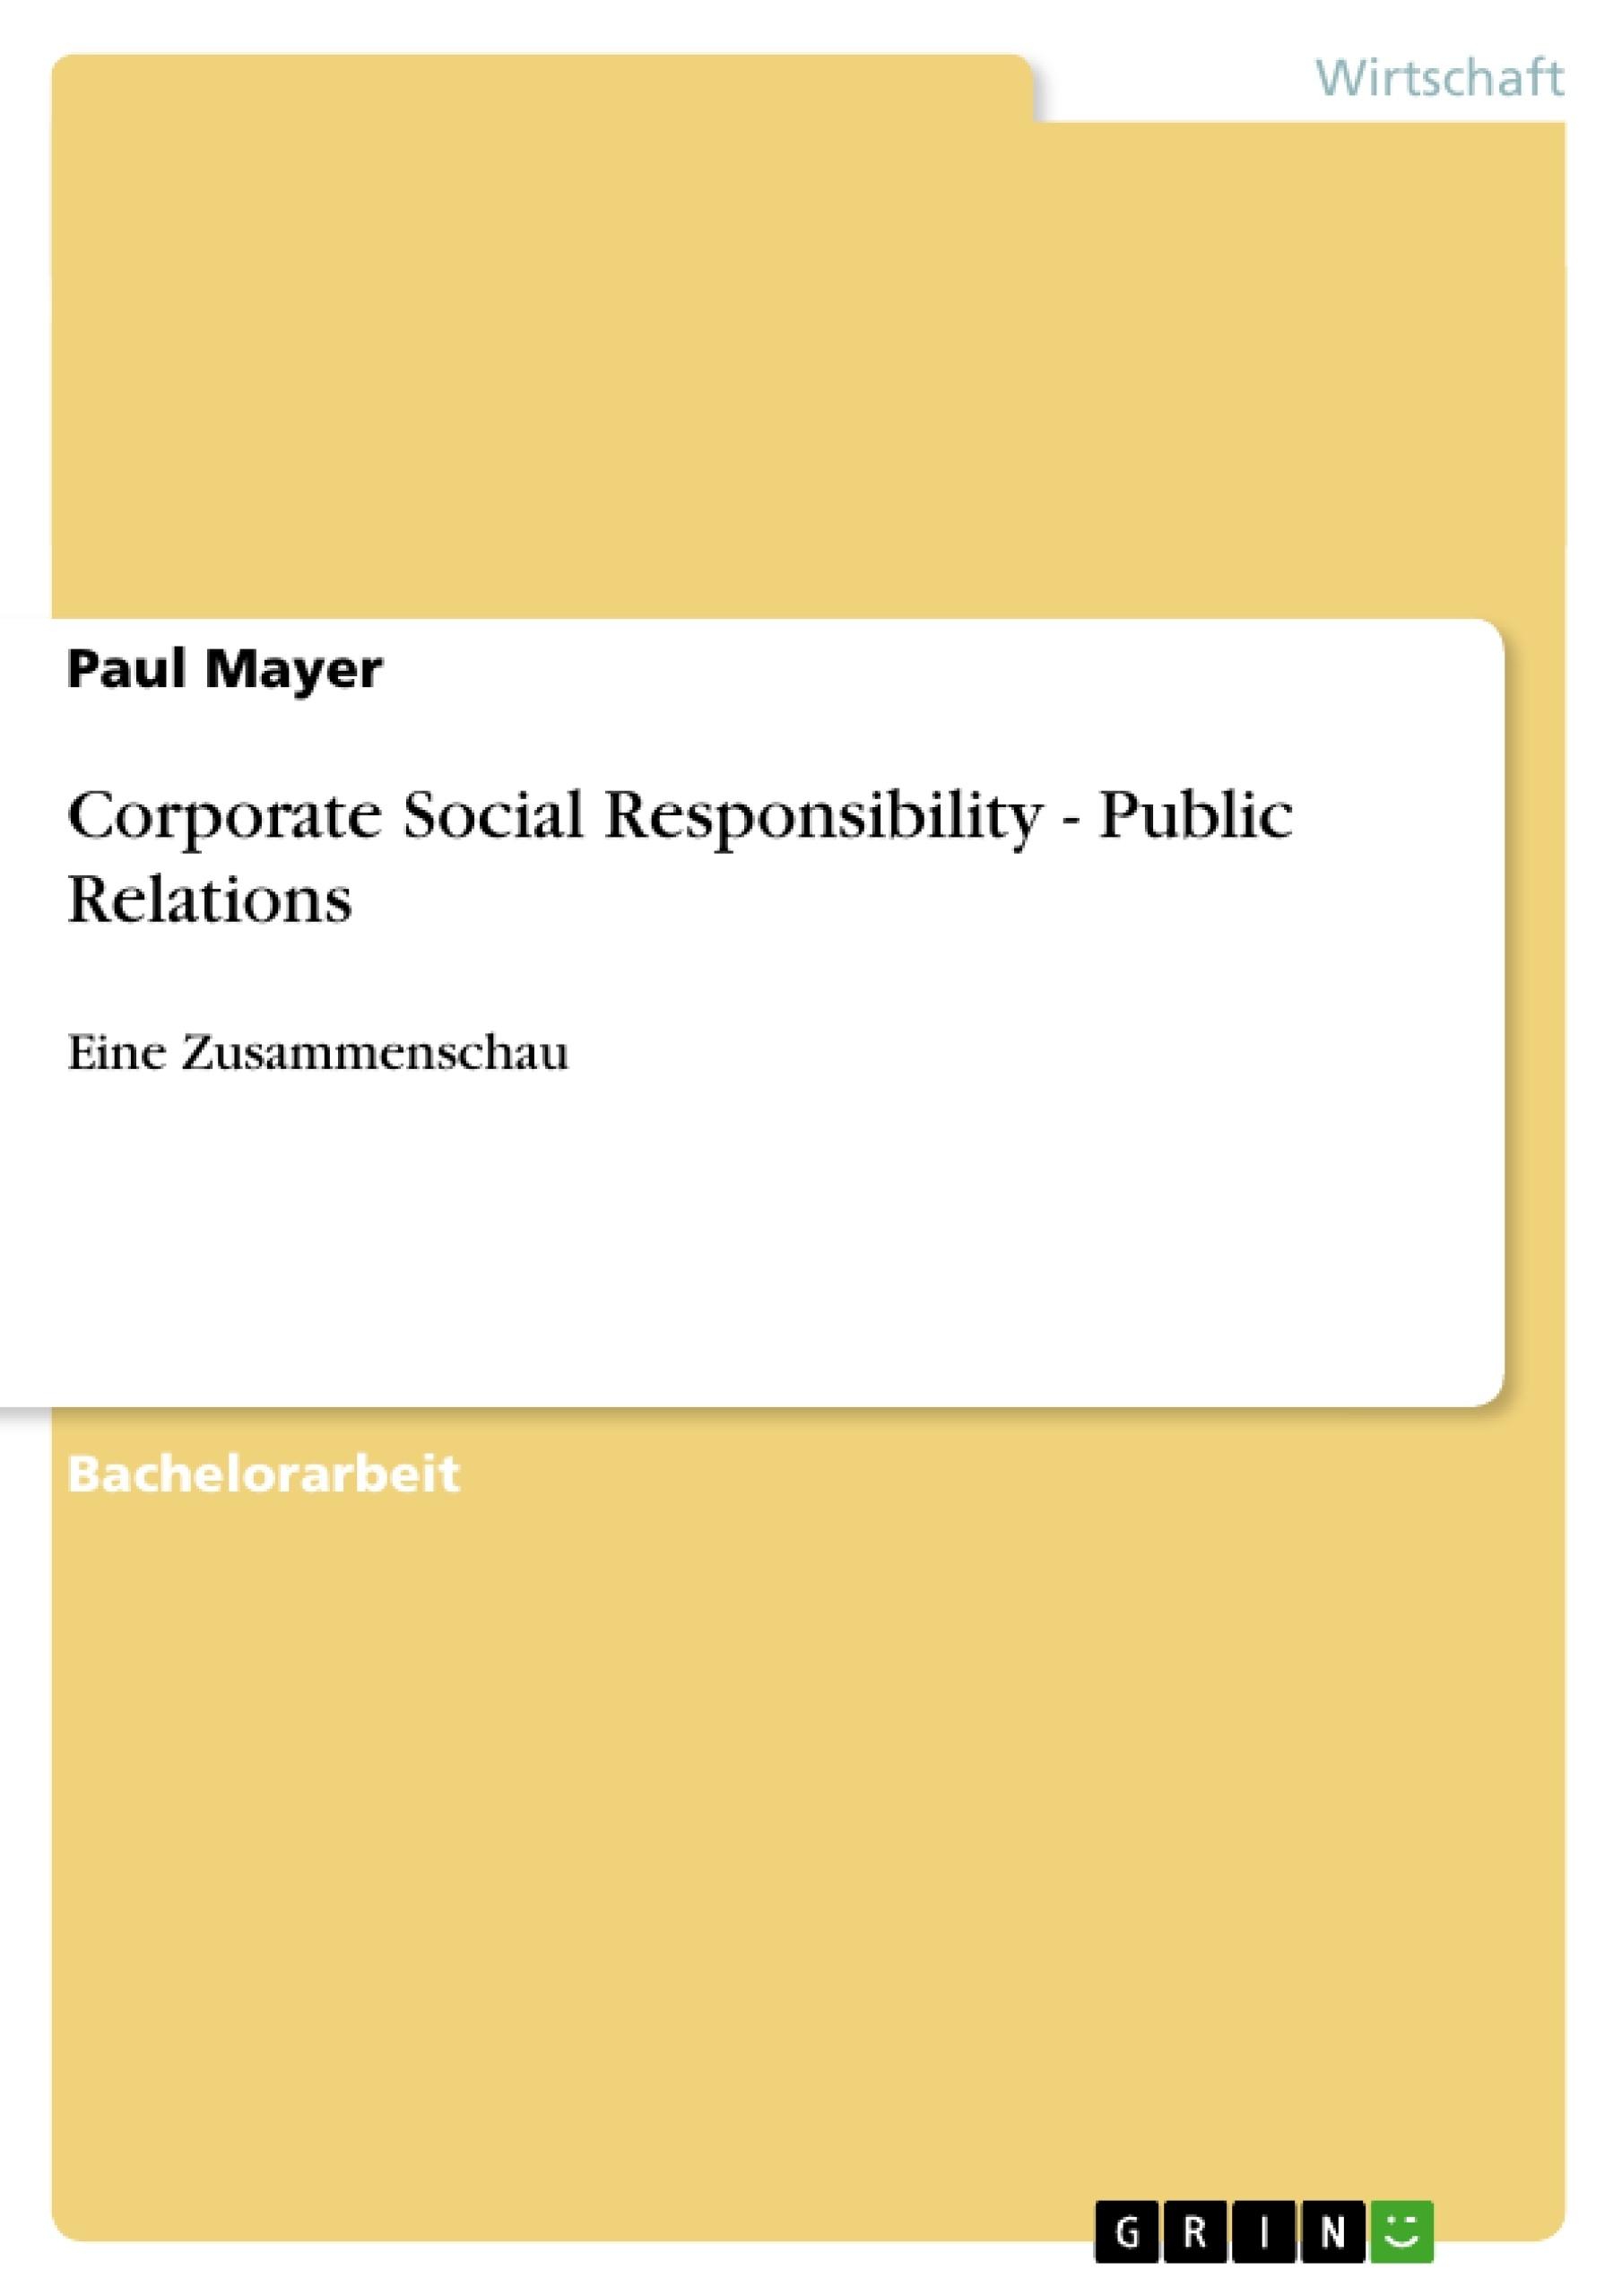 Titel: Corporate Social Responsibility - Public Relations